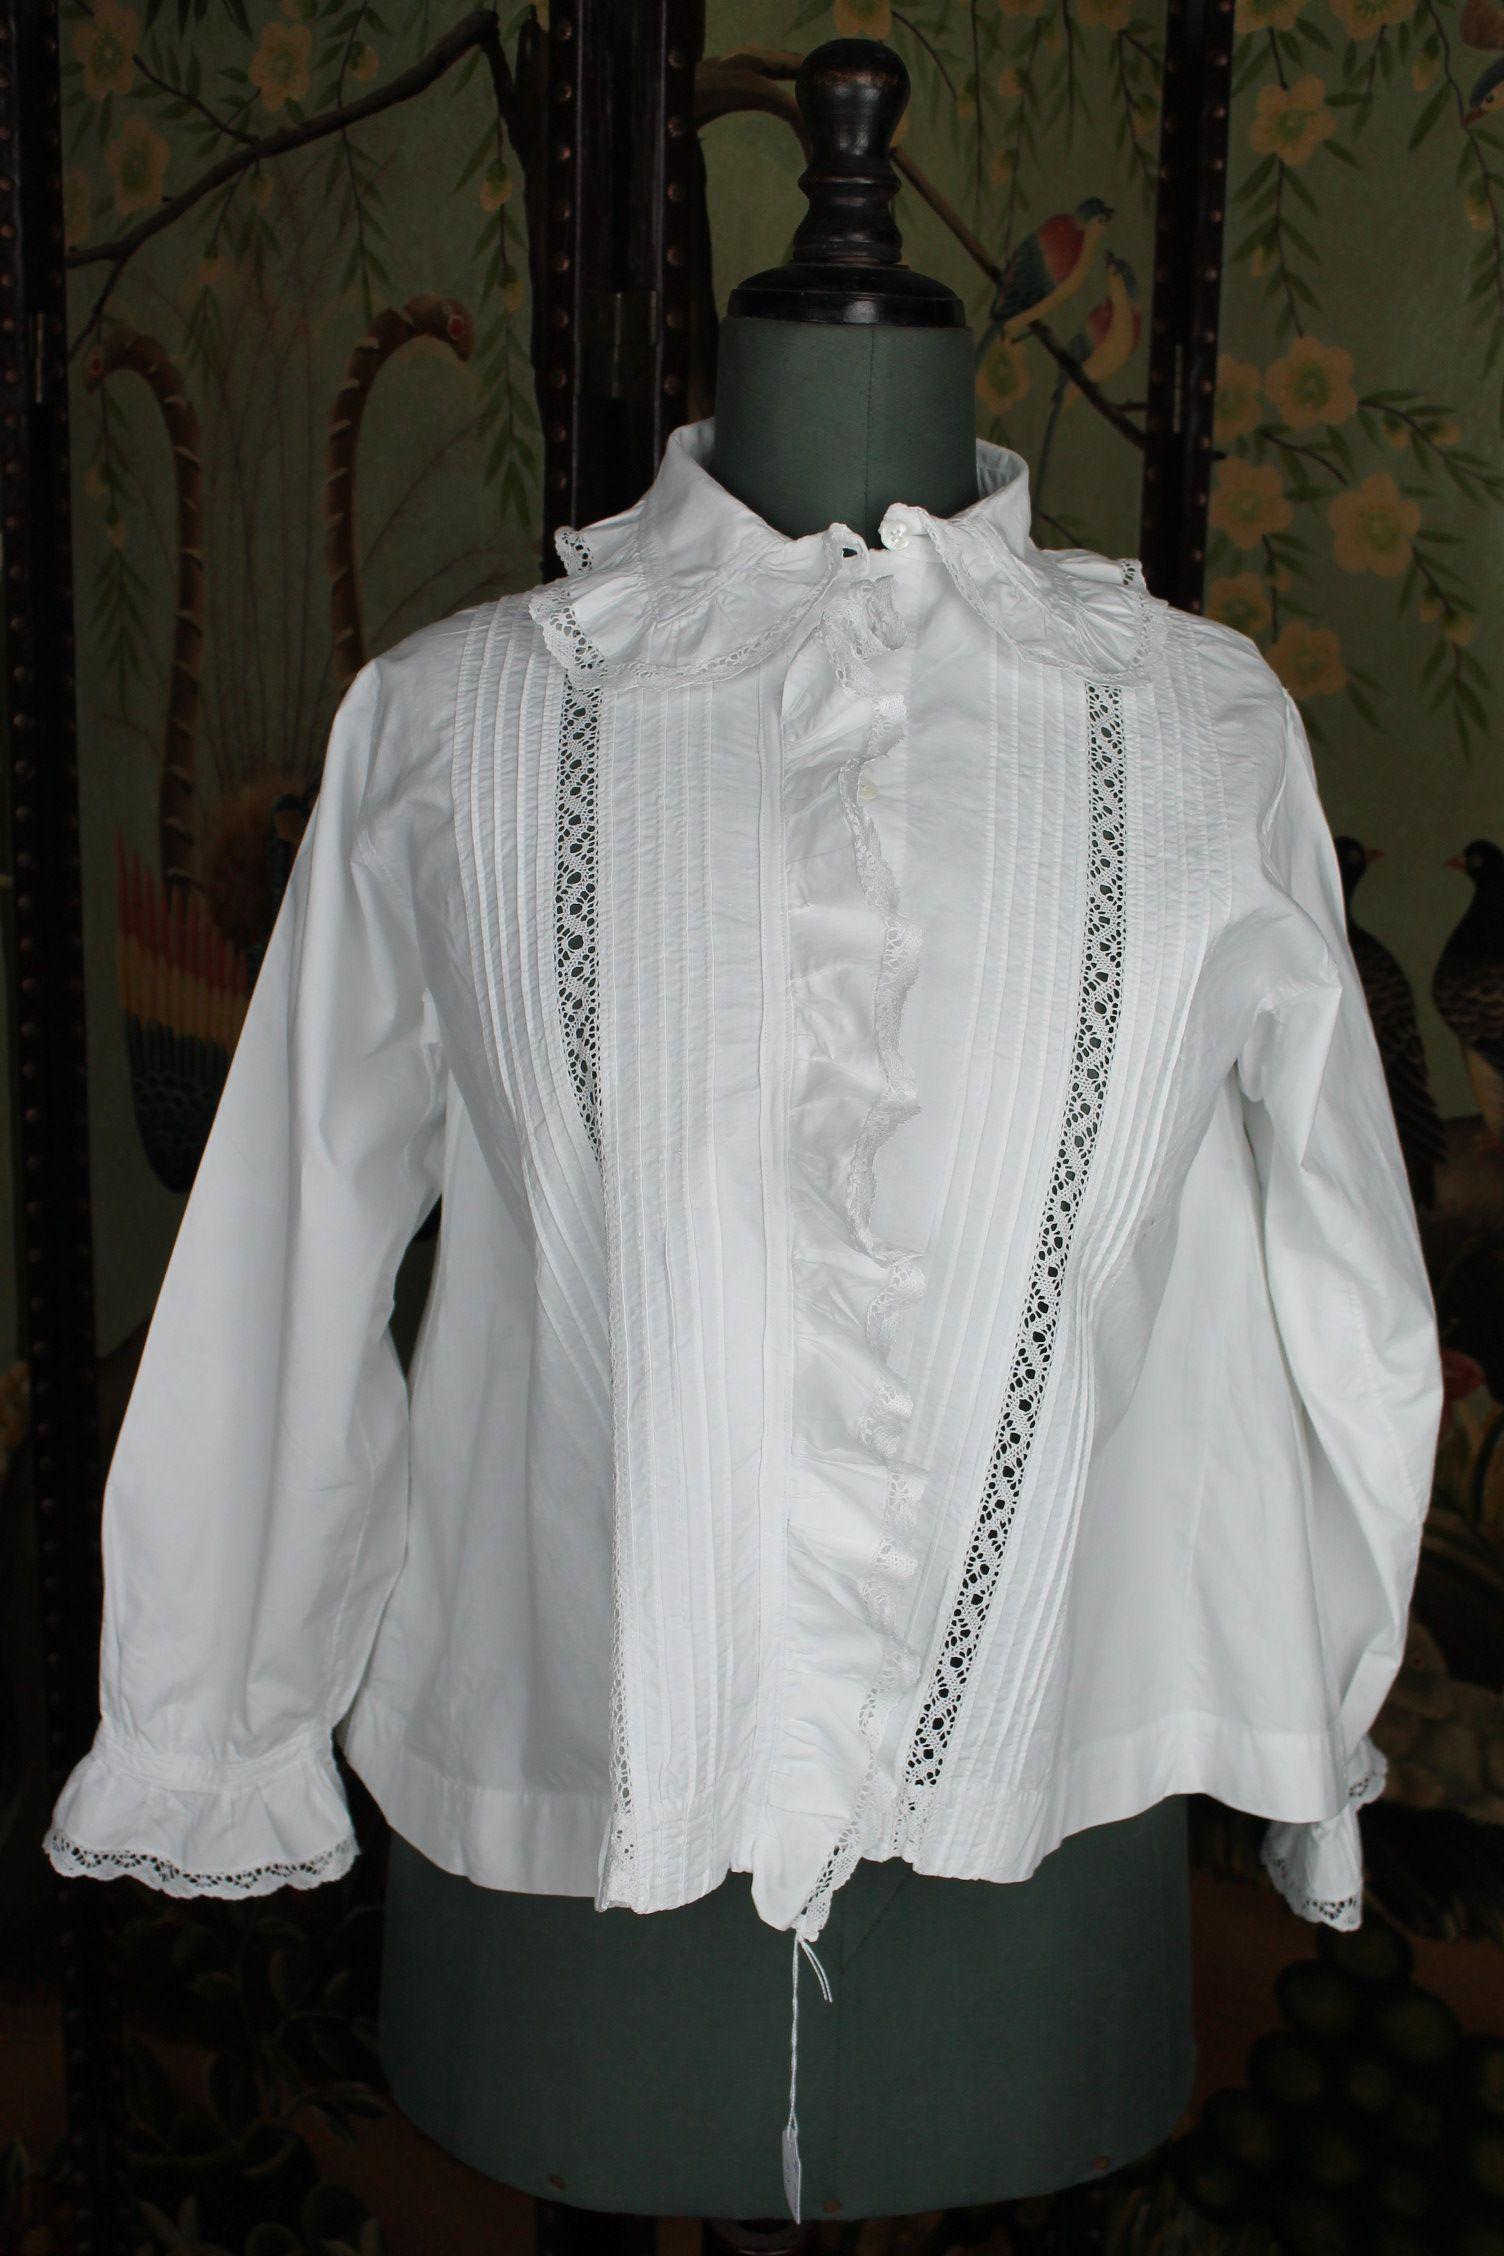 CAMISA ANTIGUA en 2020 | Camisas antiguas, Camisas, Moda antigua